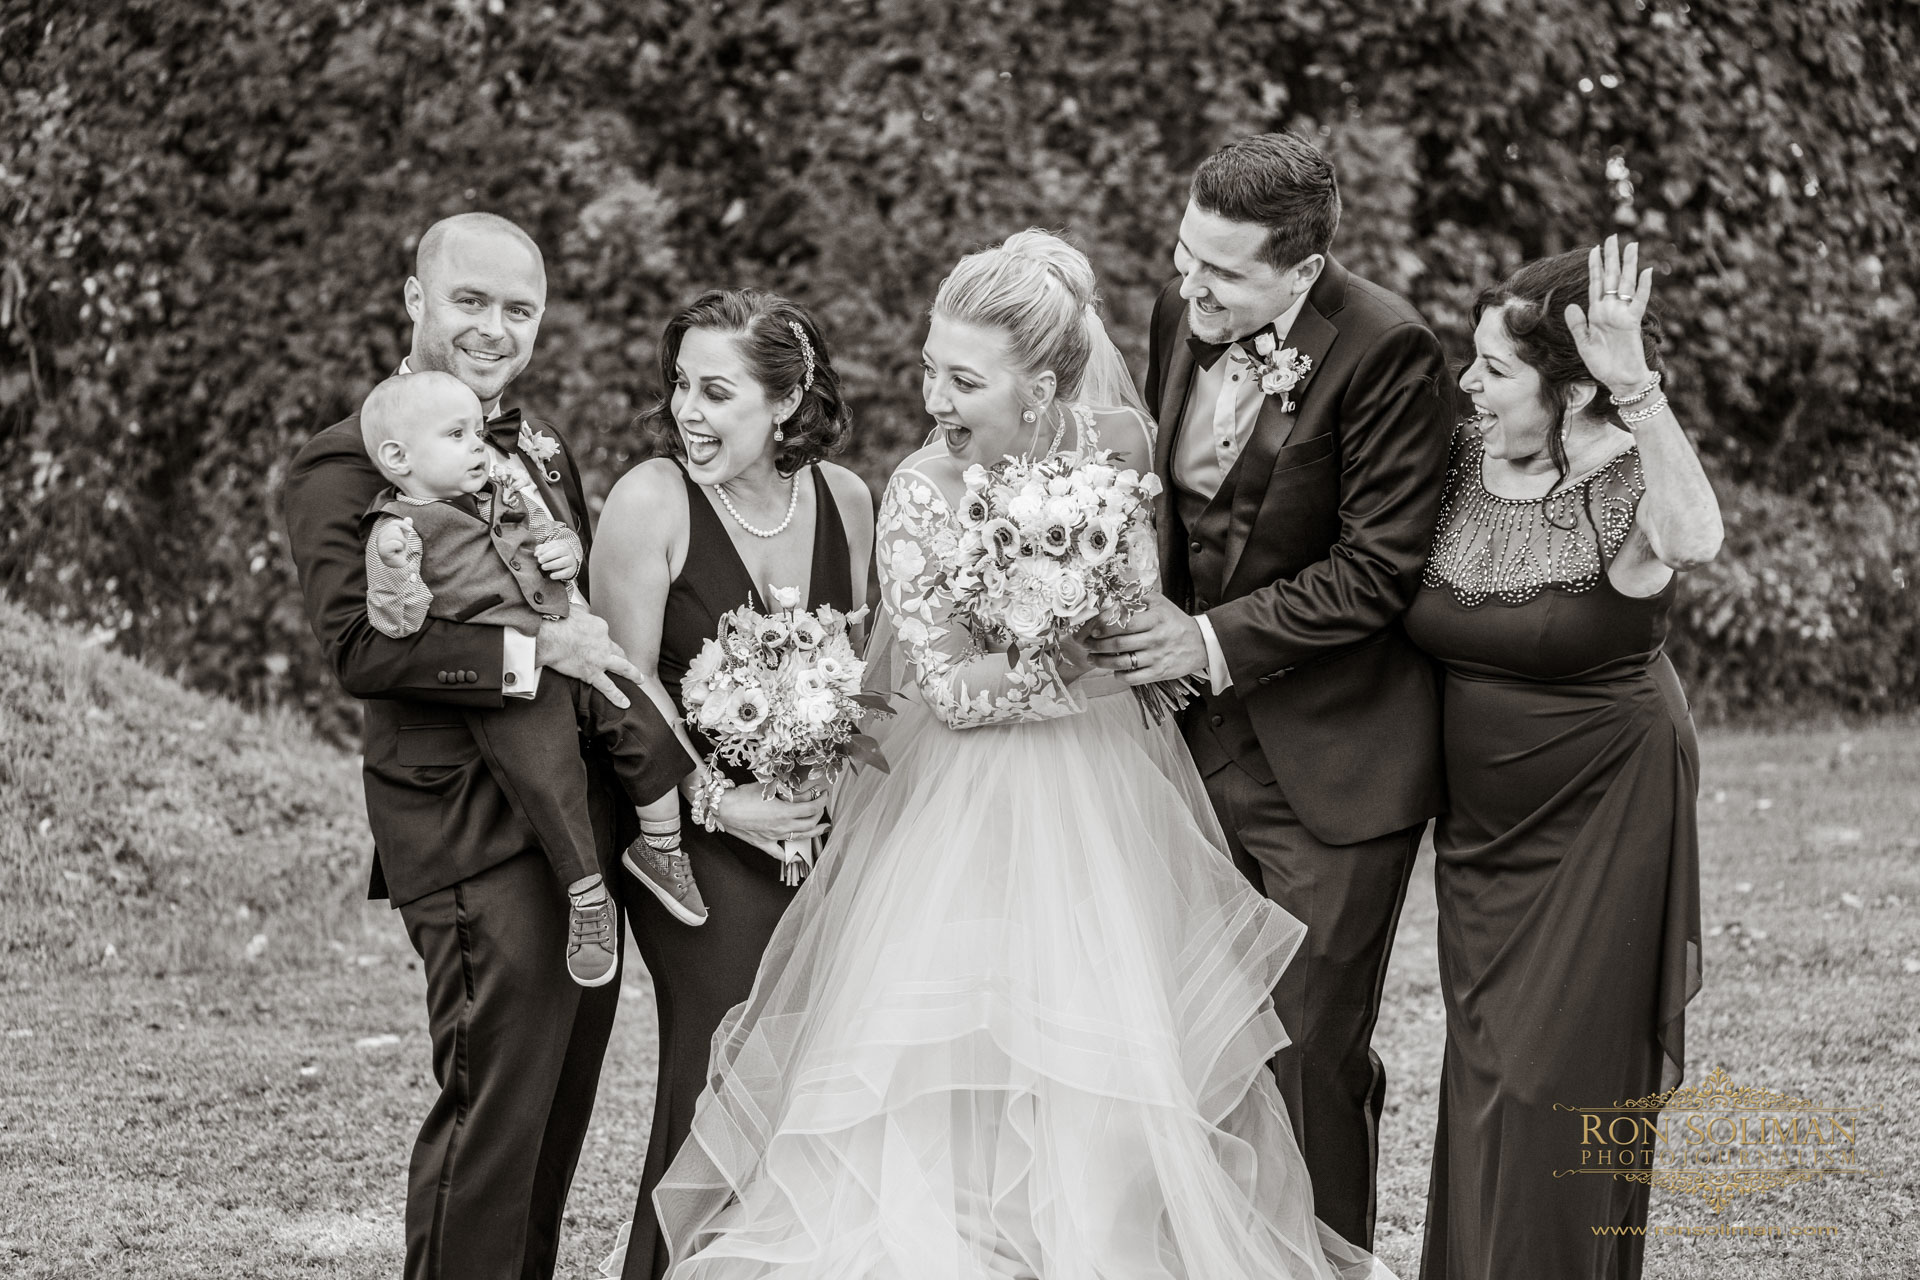 ALVERTHORPE MANOR HOUSE WEDDING 13